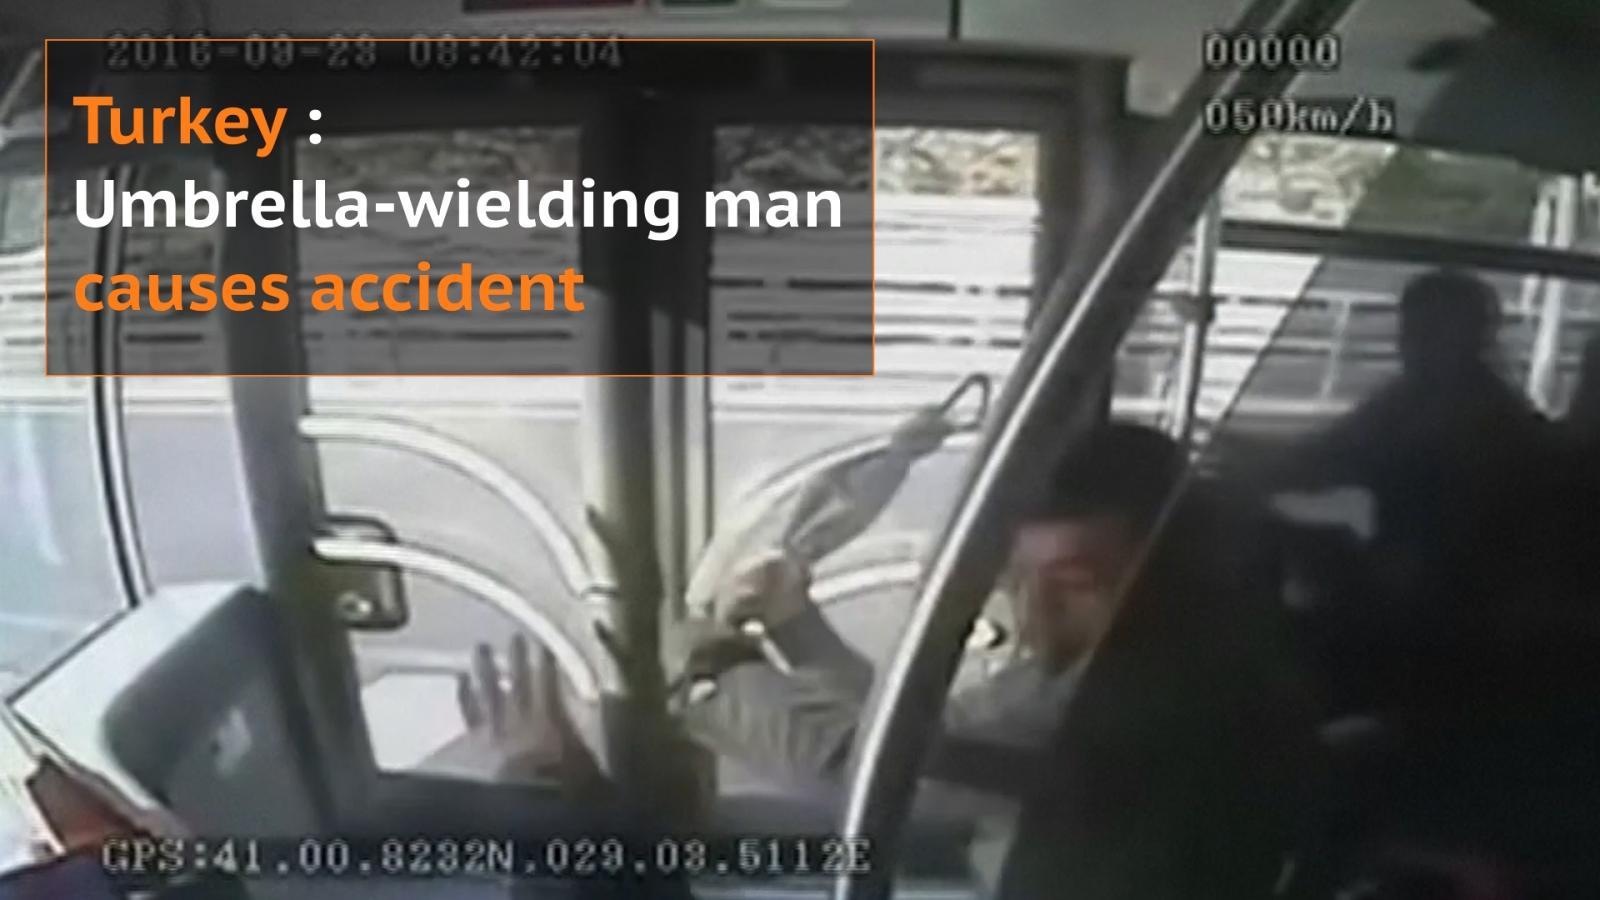 Umbrella-wielding man causes accident